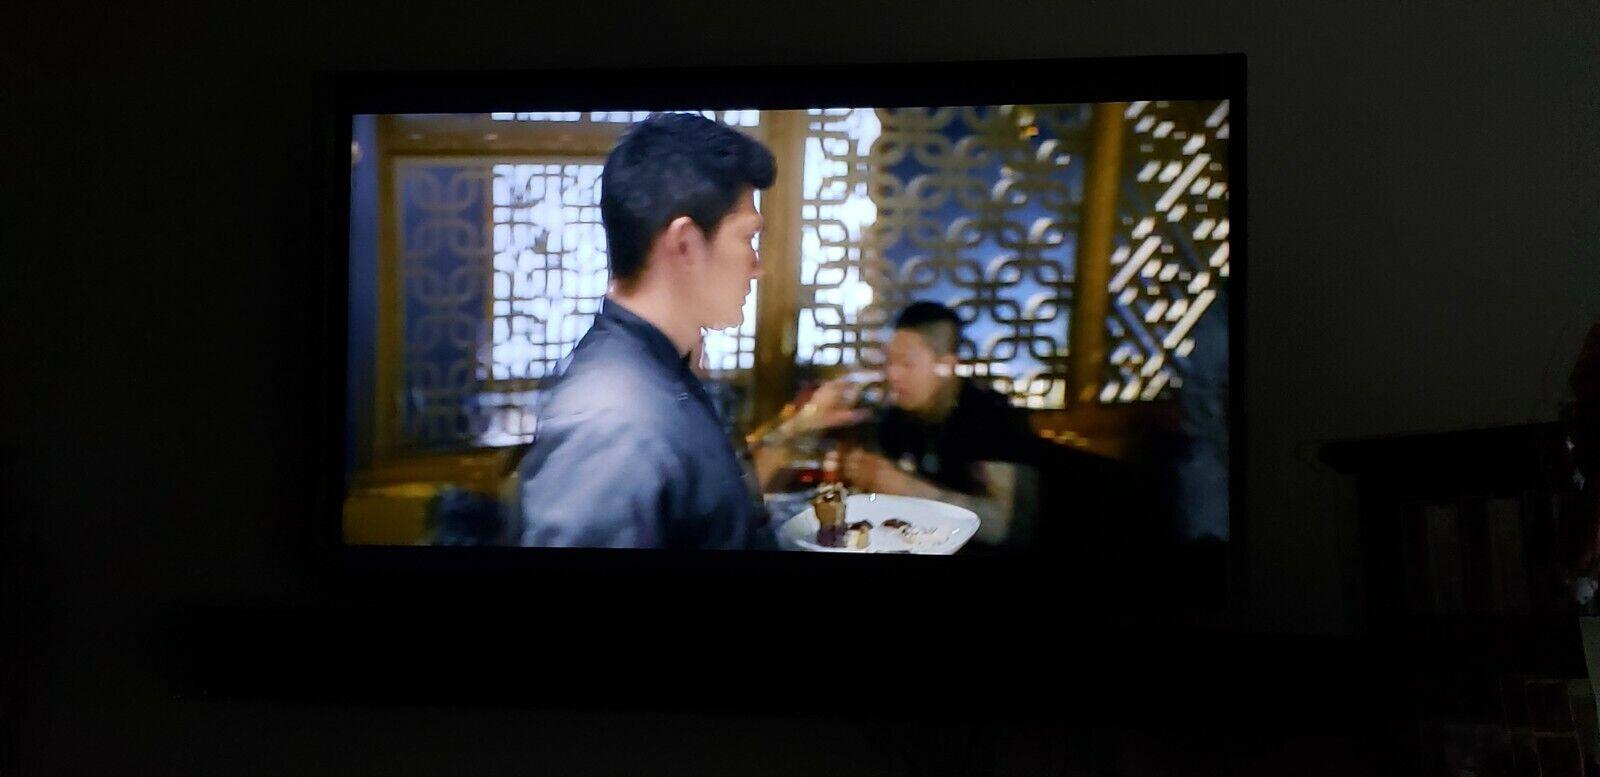 "Samsung UN46D6000 46"" 1080p HD LED LCD Television"